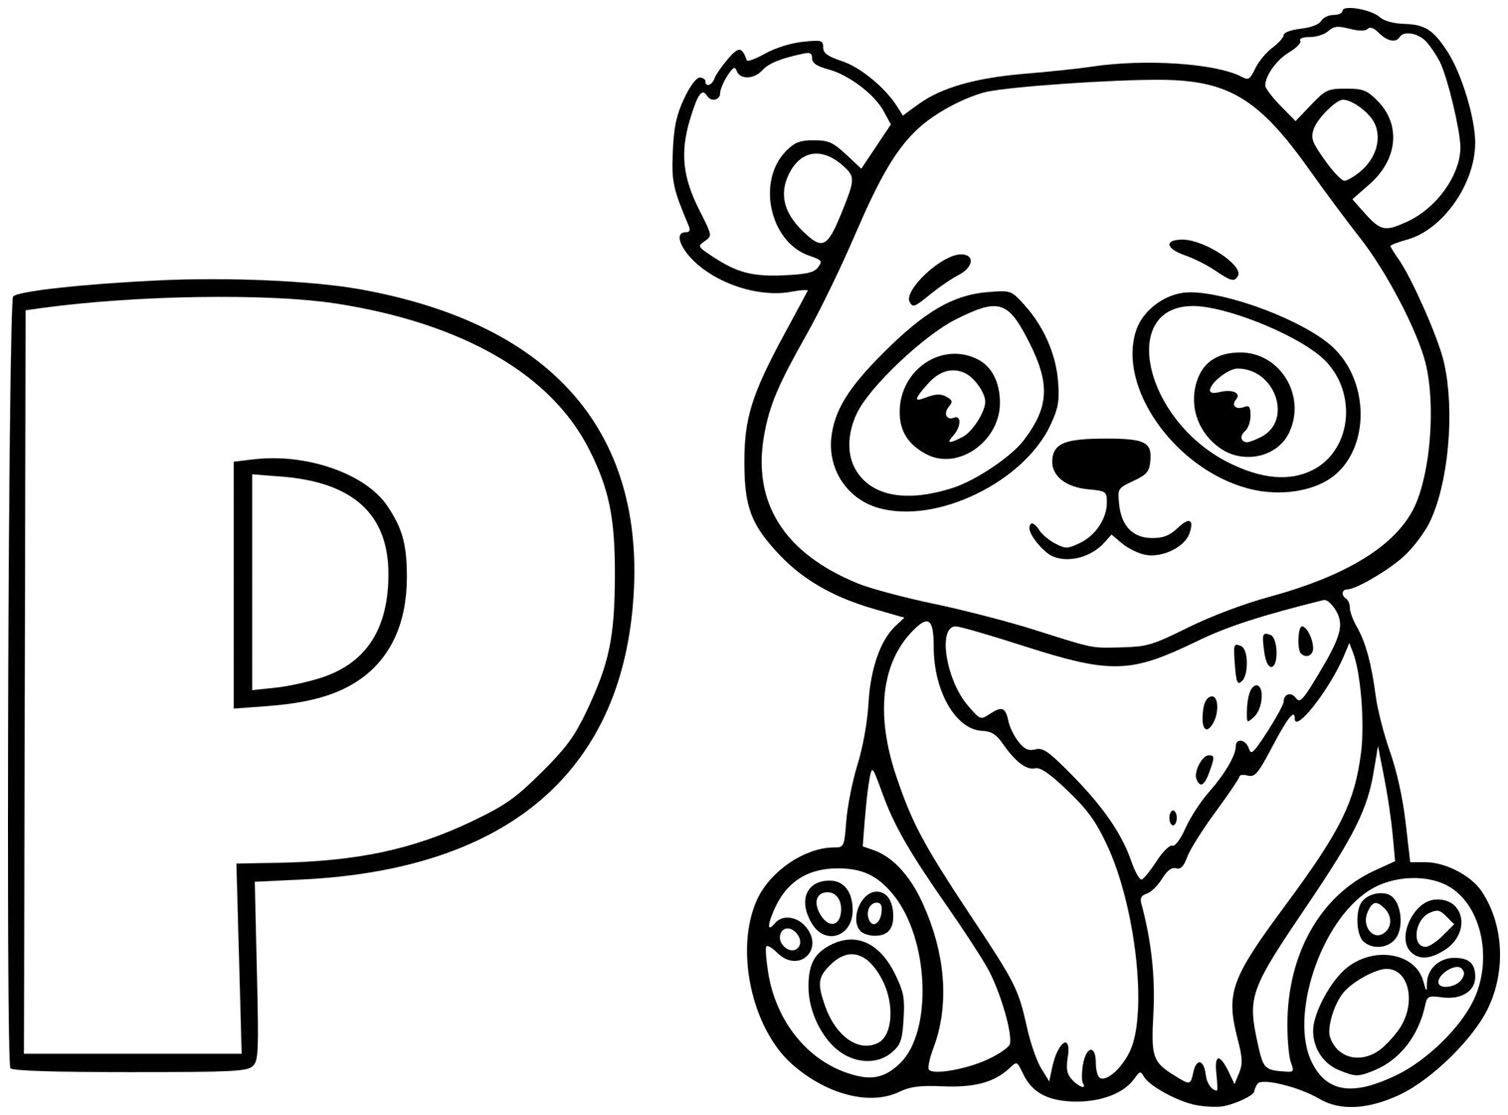 Pandas to download for free - Pandas Kids Coloring Pages